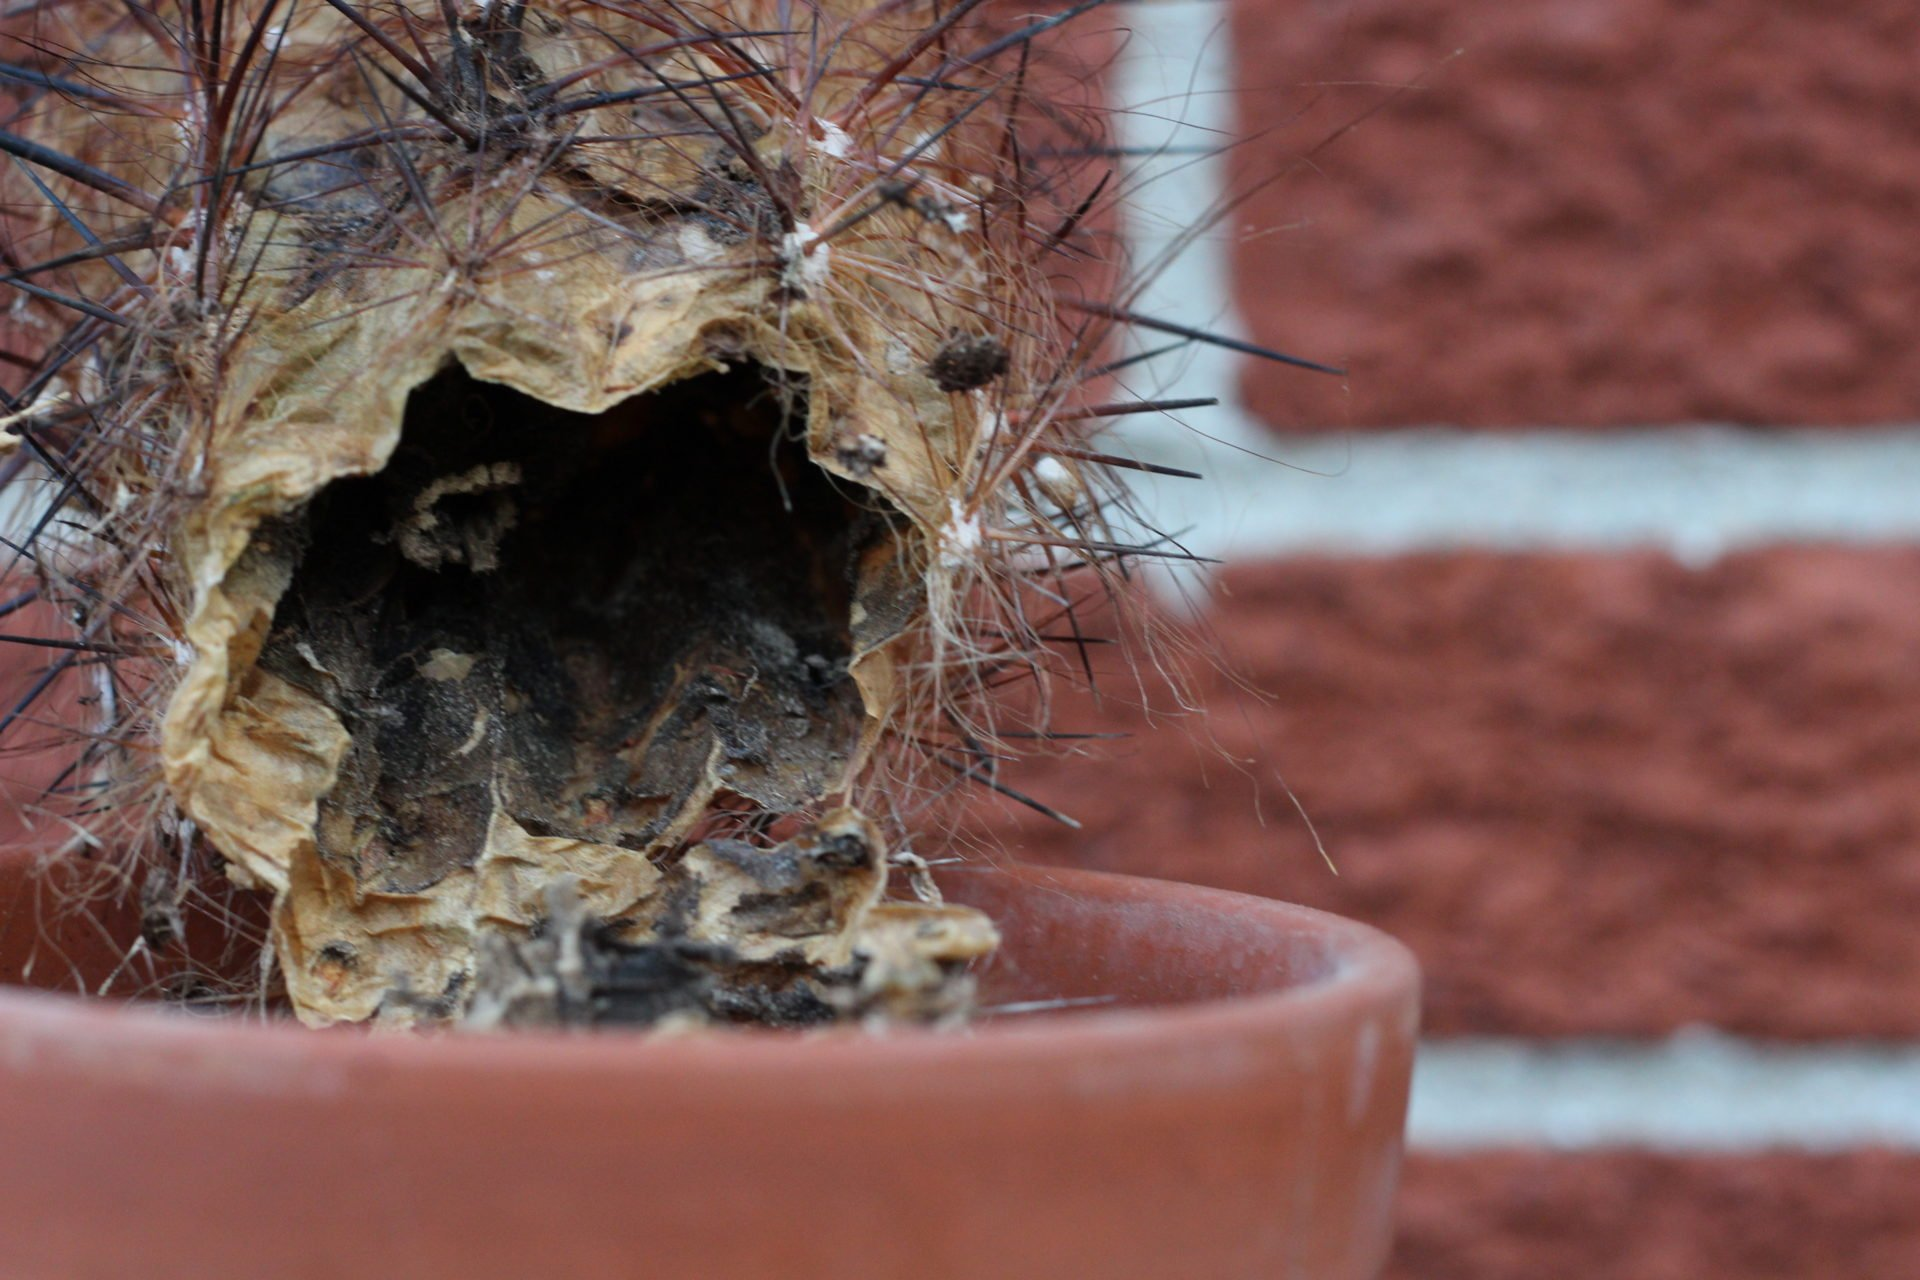 hollow cactus